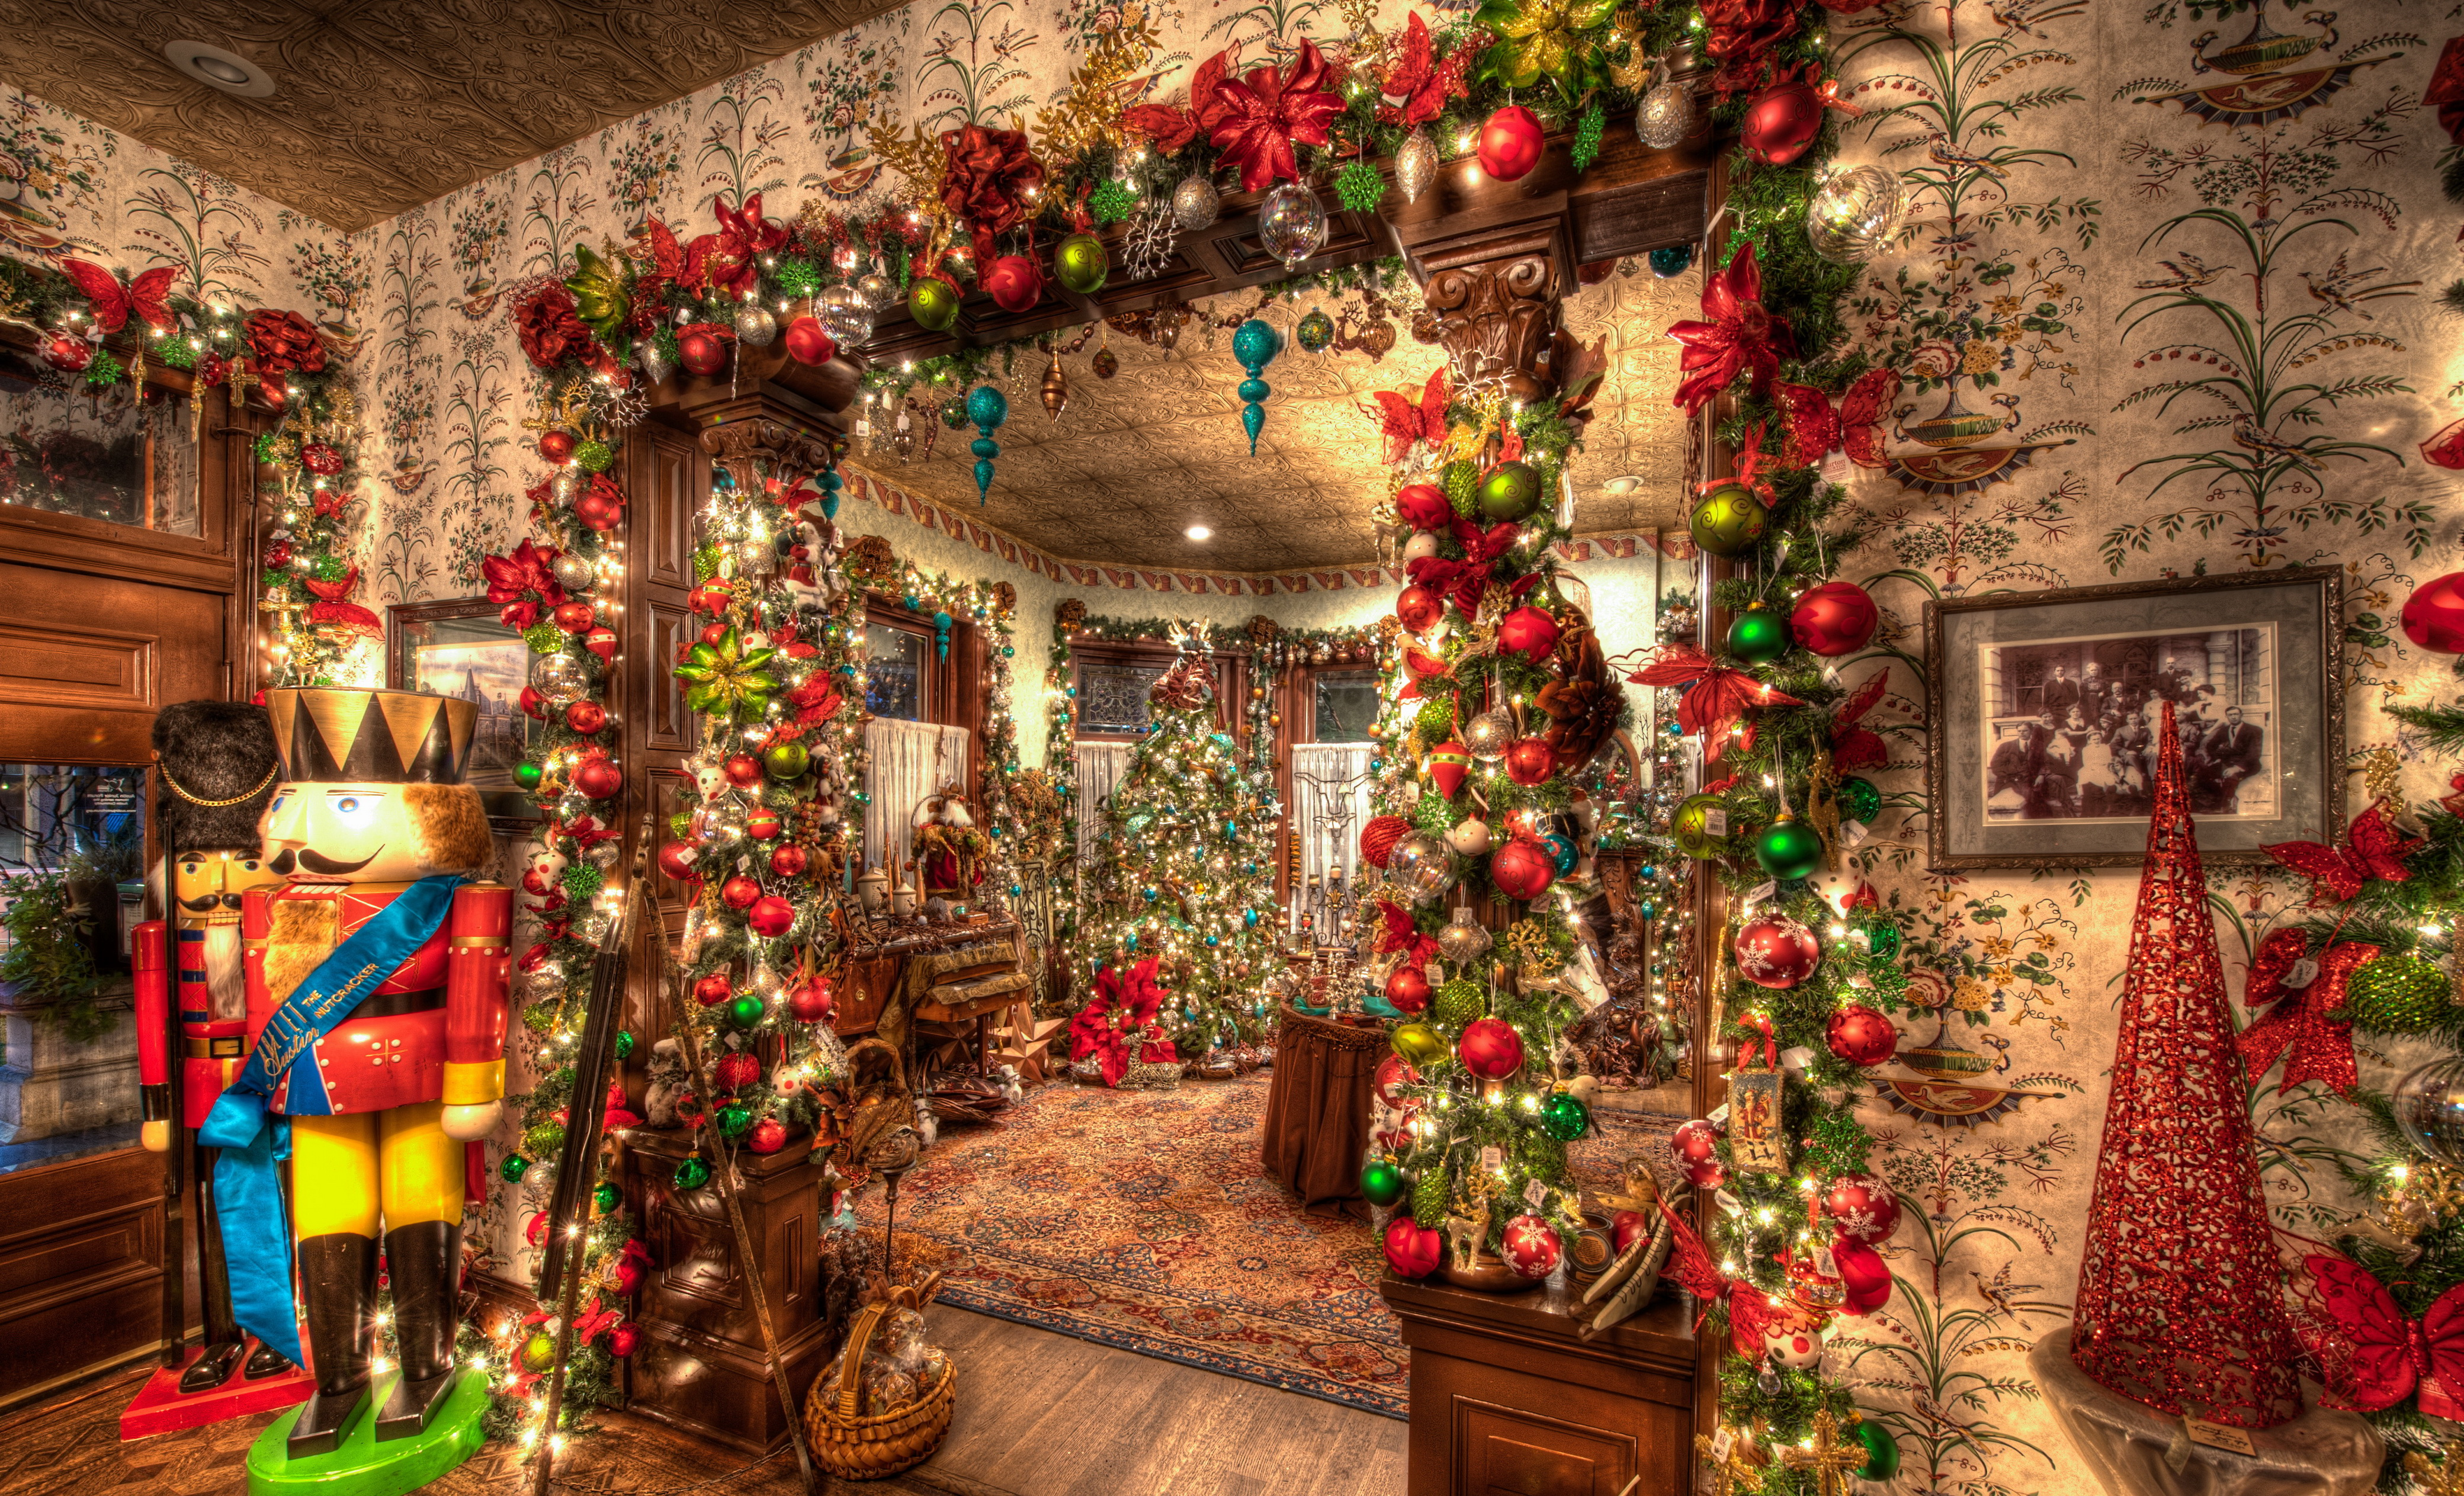 Christmas Stock Photos Images Royalty Free Christmas